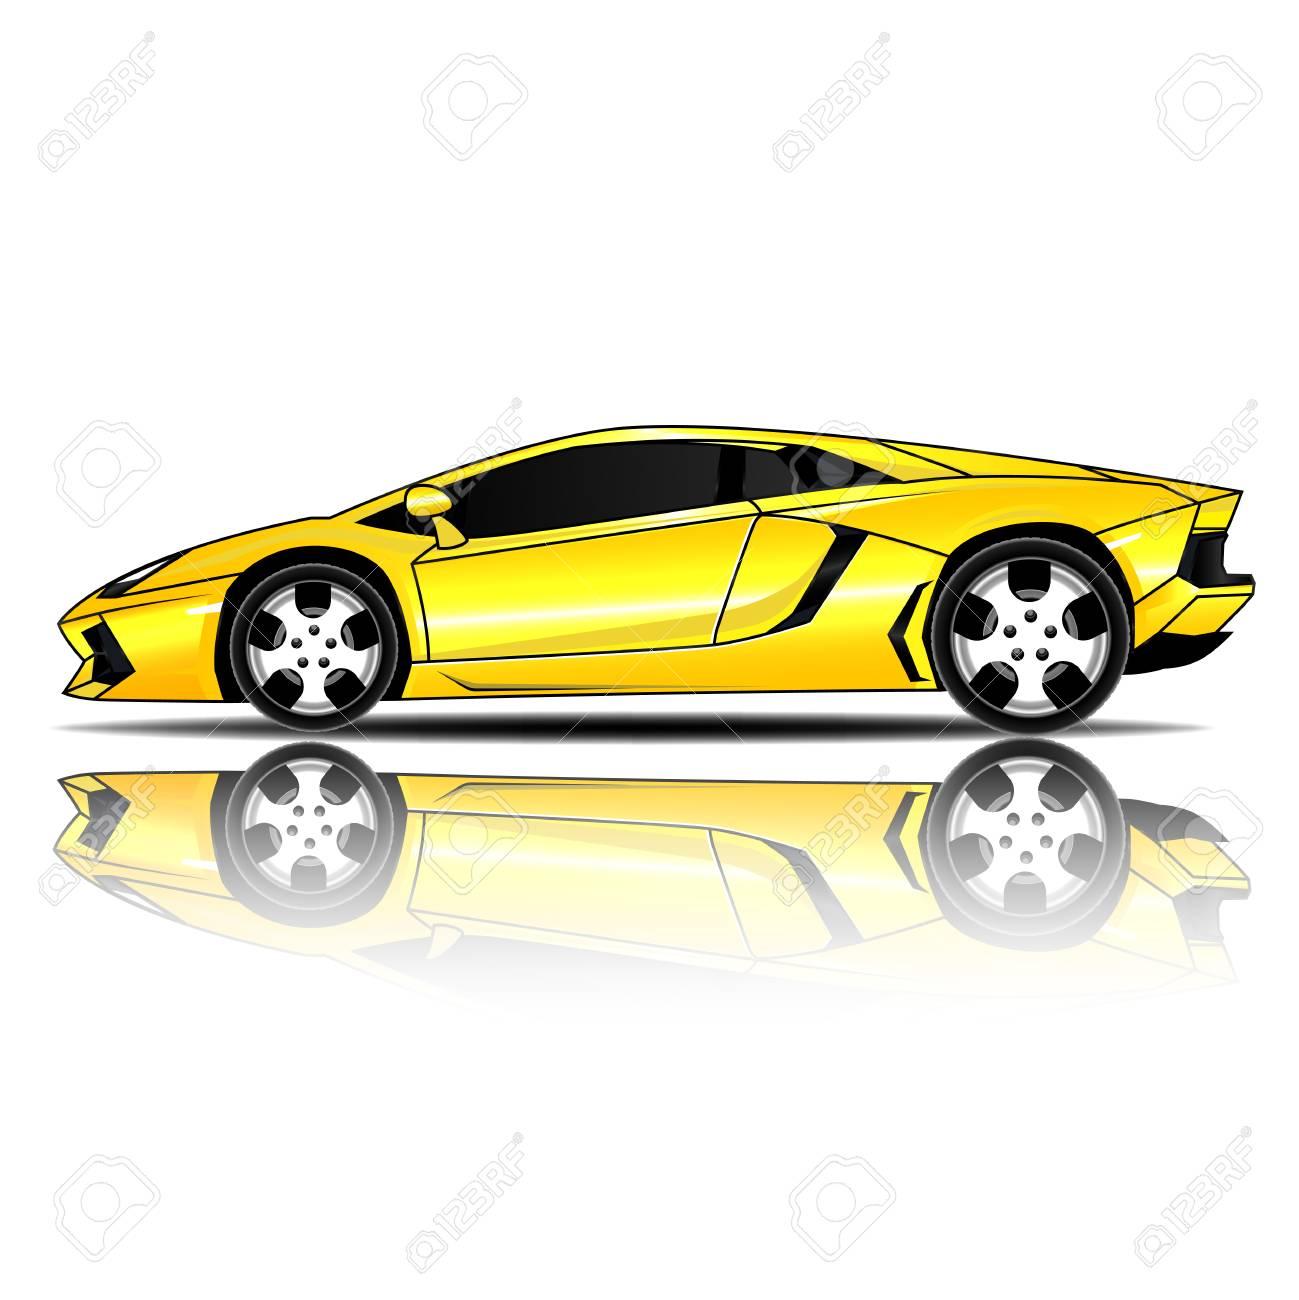 Sports Car Vector Illustration Royalty Free Cliparts Vectors And